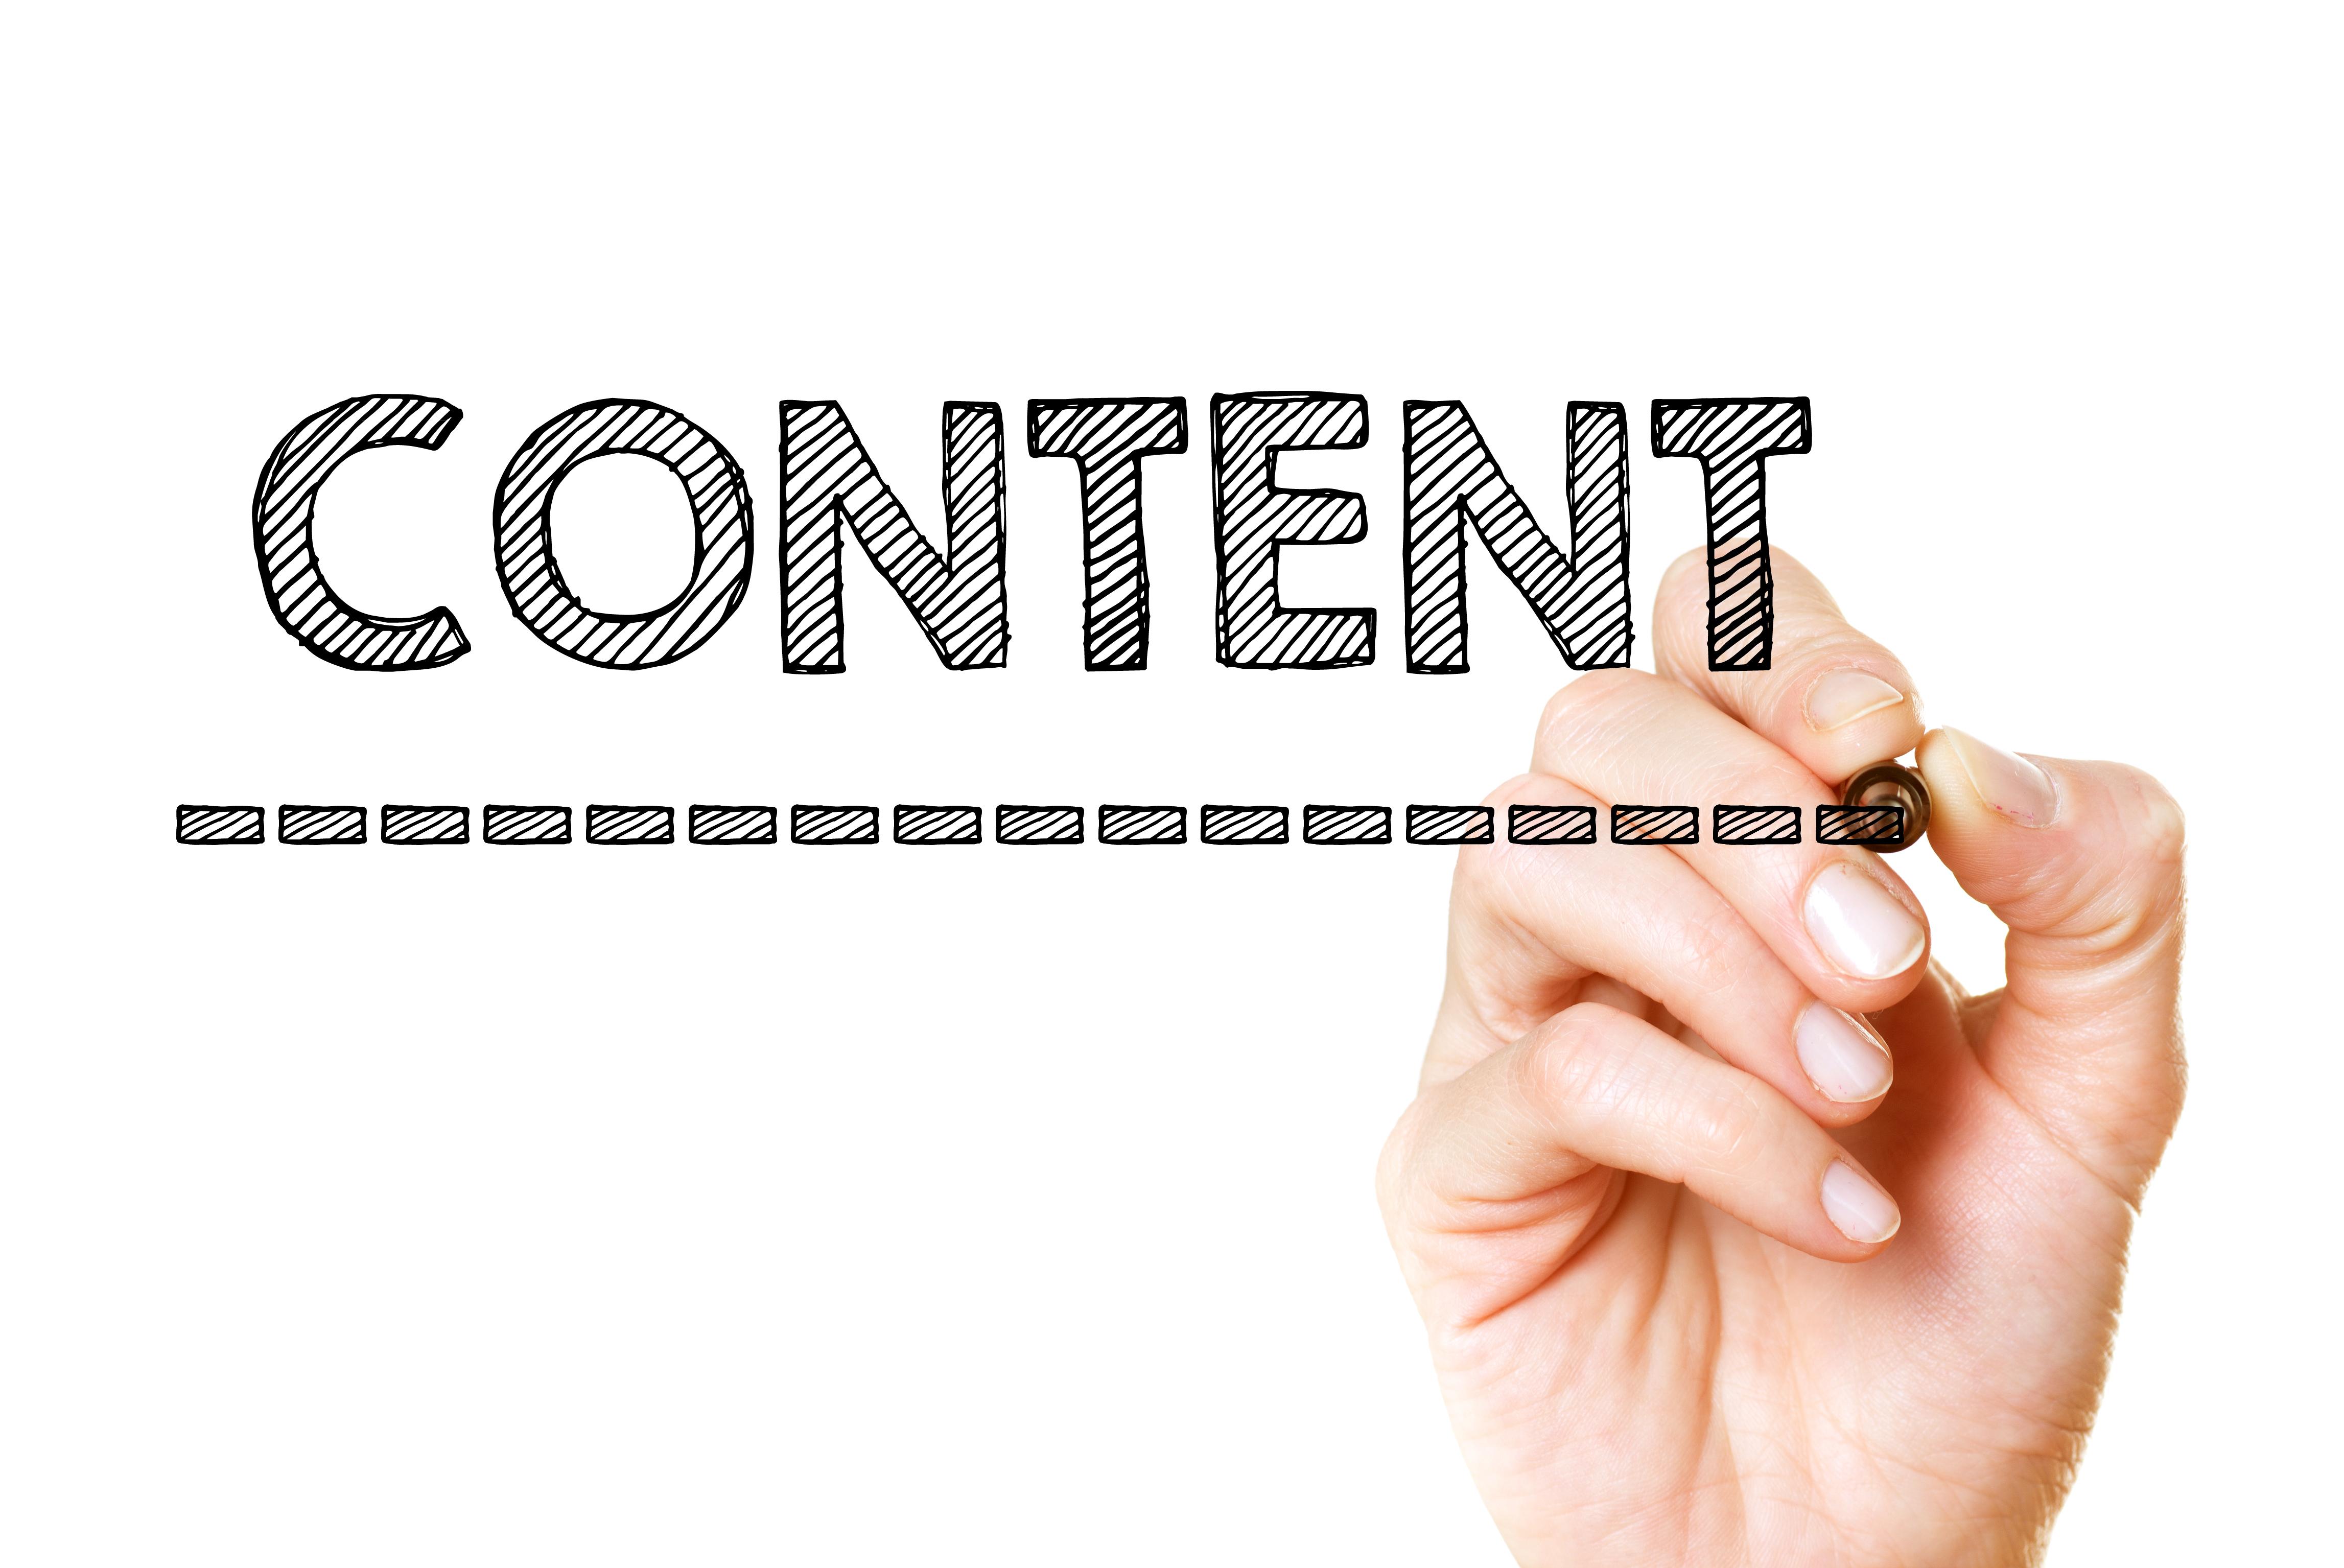 nhung-cau-hoi-can-giai-quyet-khi-ban-lam-content-marketing-1